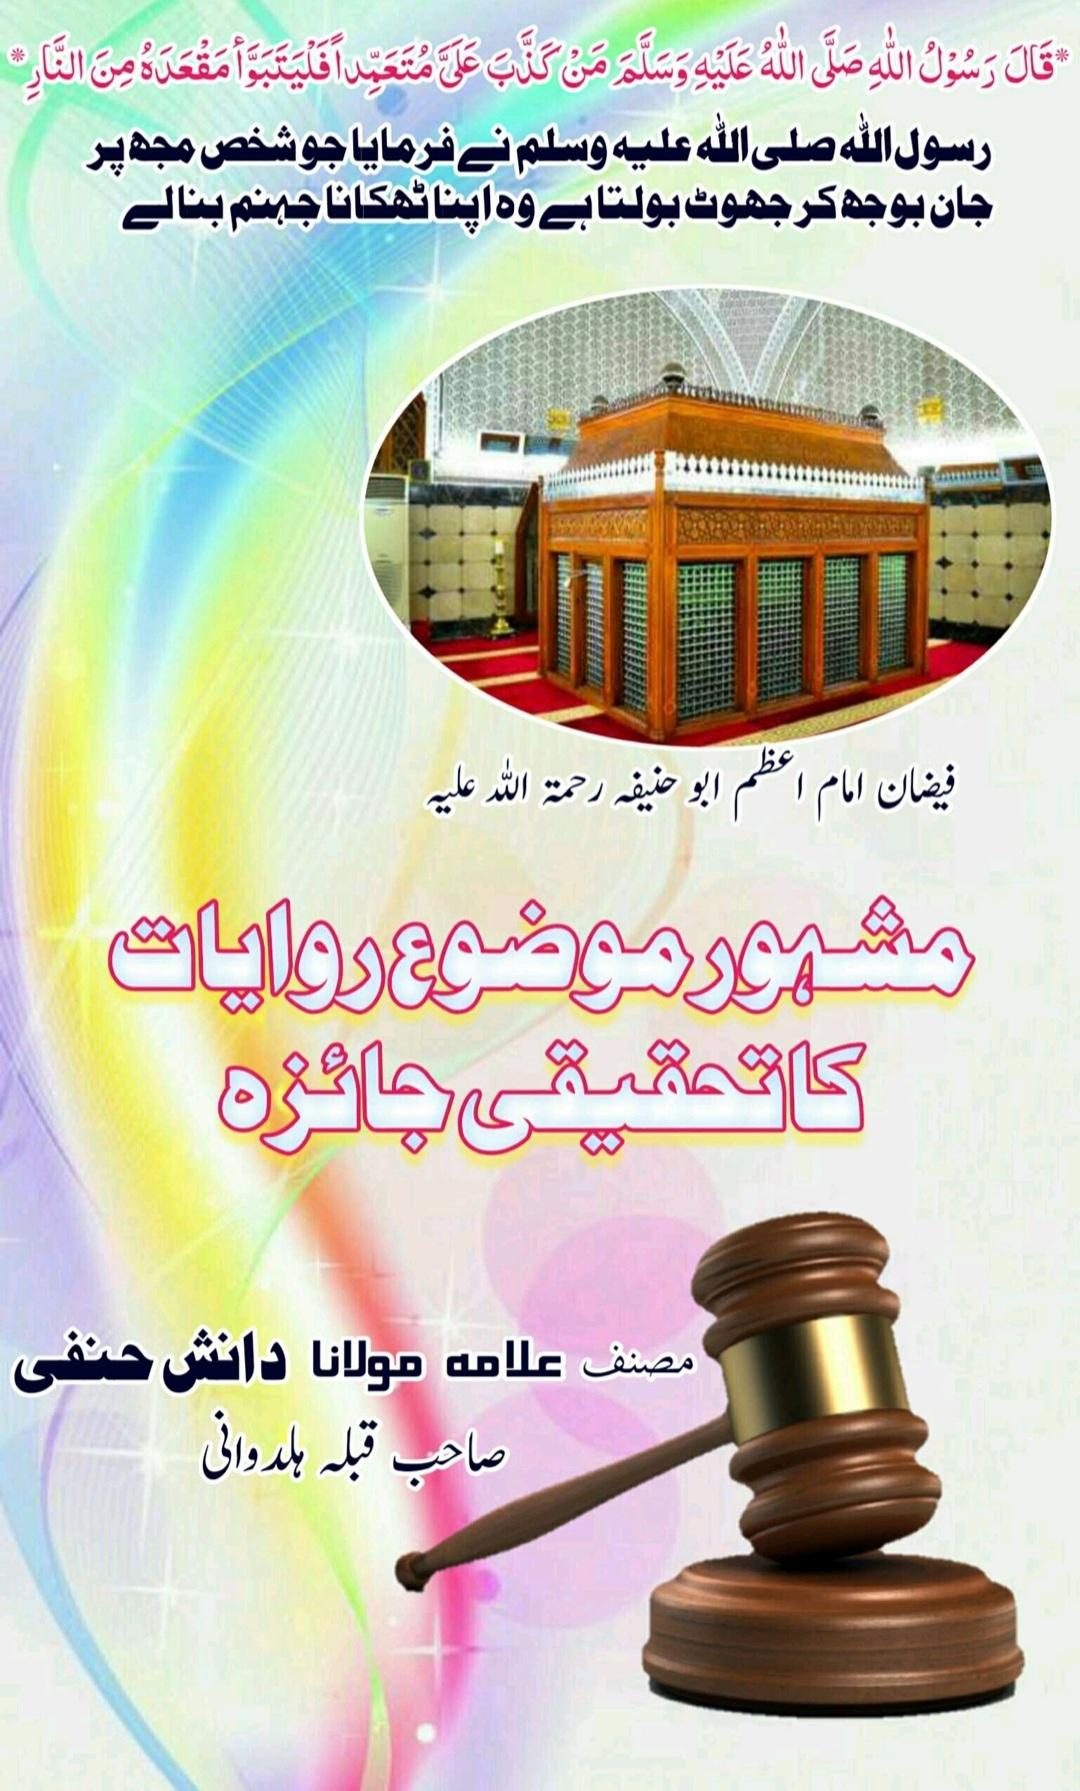 Mashoor Mozo Riwayat Ka Tehqiqi Jaiza / مشہور موضوع روایات کا تحقیقی جائزہby مولانا دانش حنفی صاحب